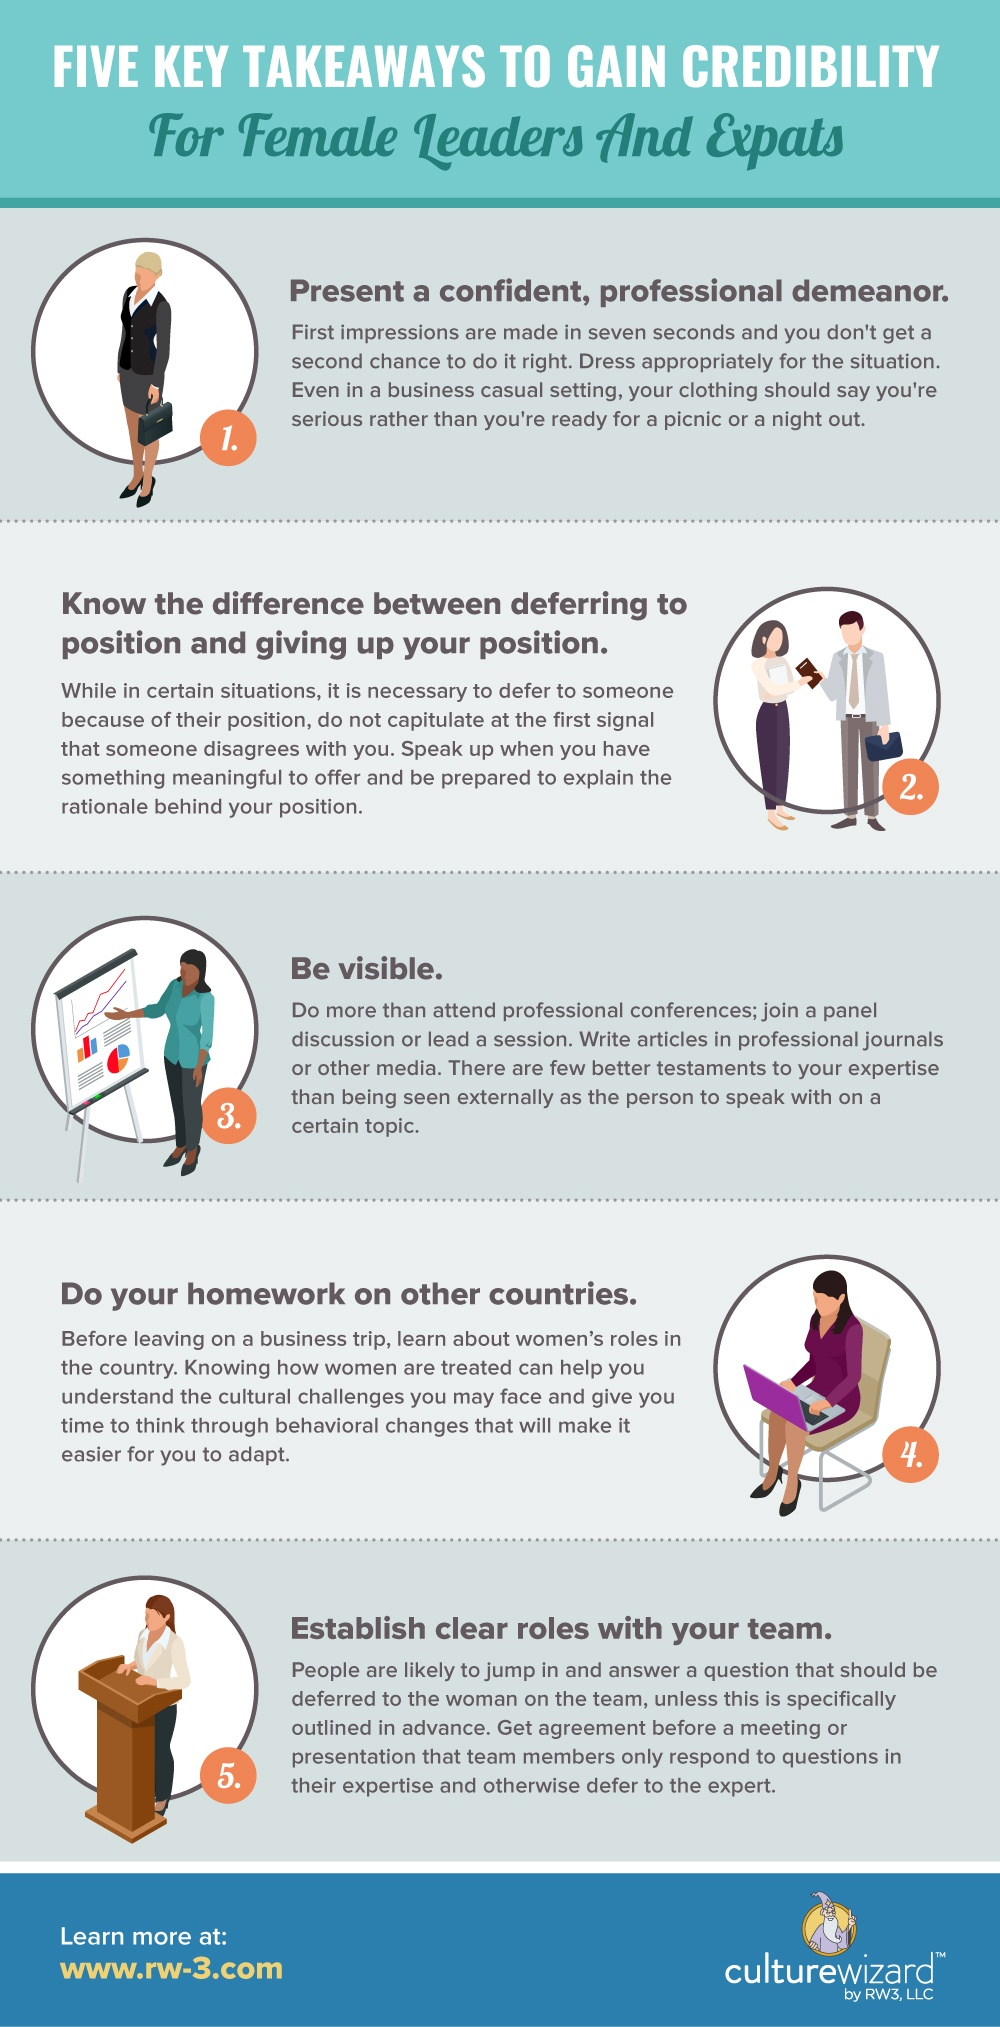 Five-Key-Takeaways-To-Gain-Credibility Infographic.jpg